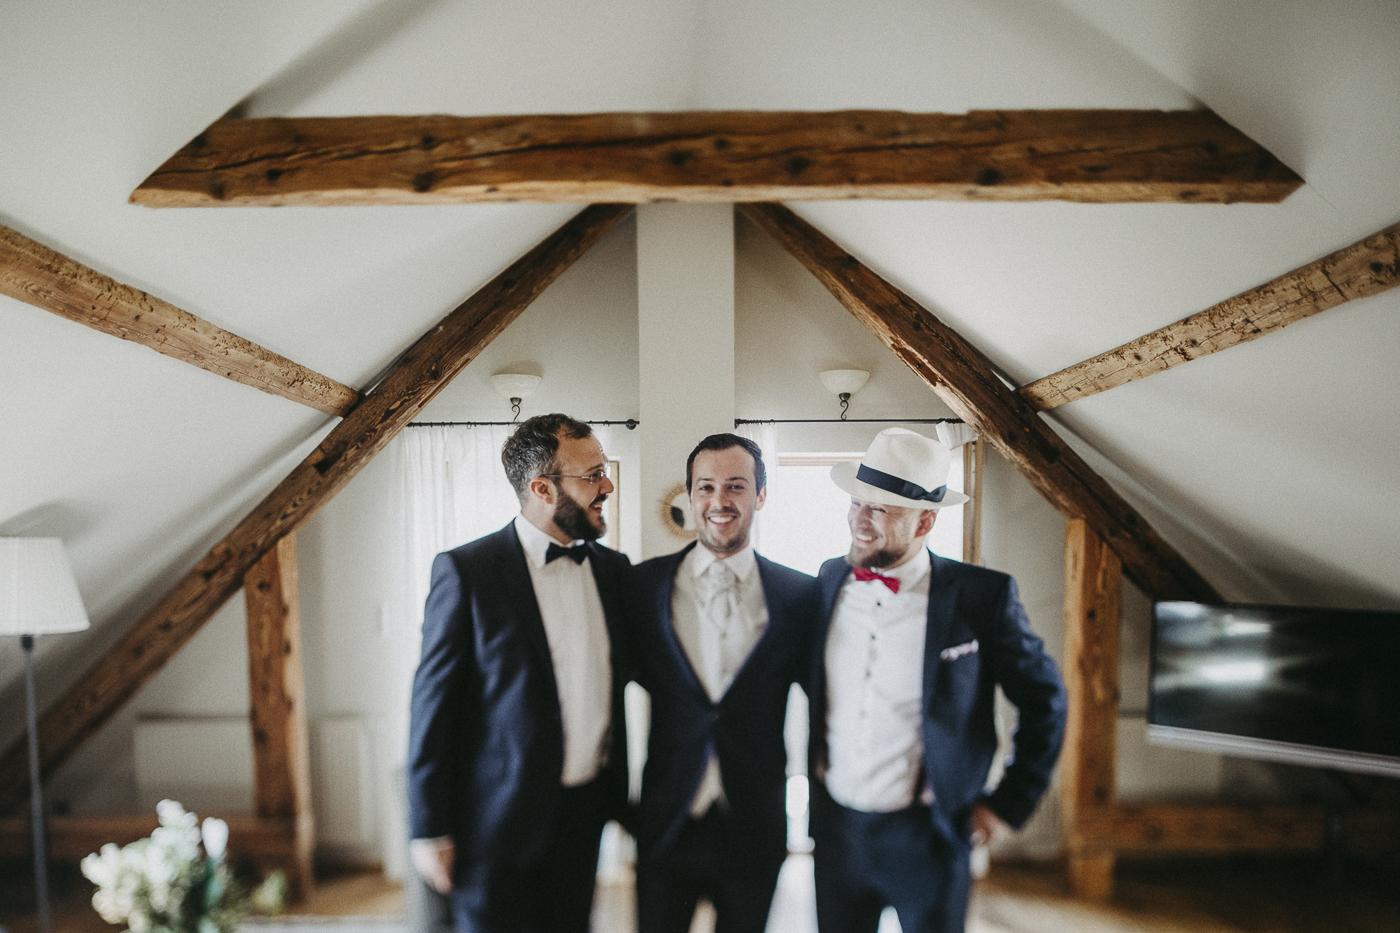 rosemarrylemon_ND_Hochzeit_Hochzeitsplanung16.jpg